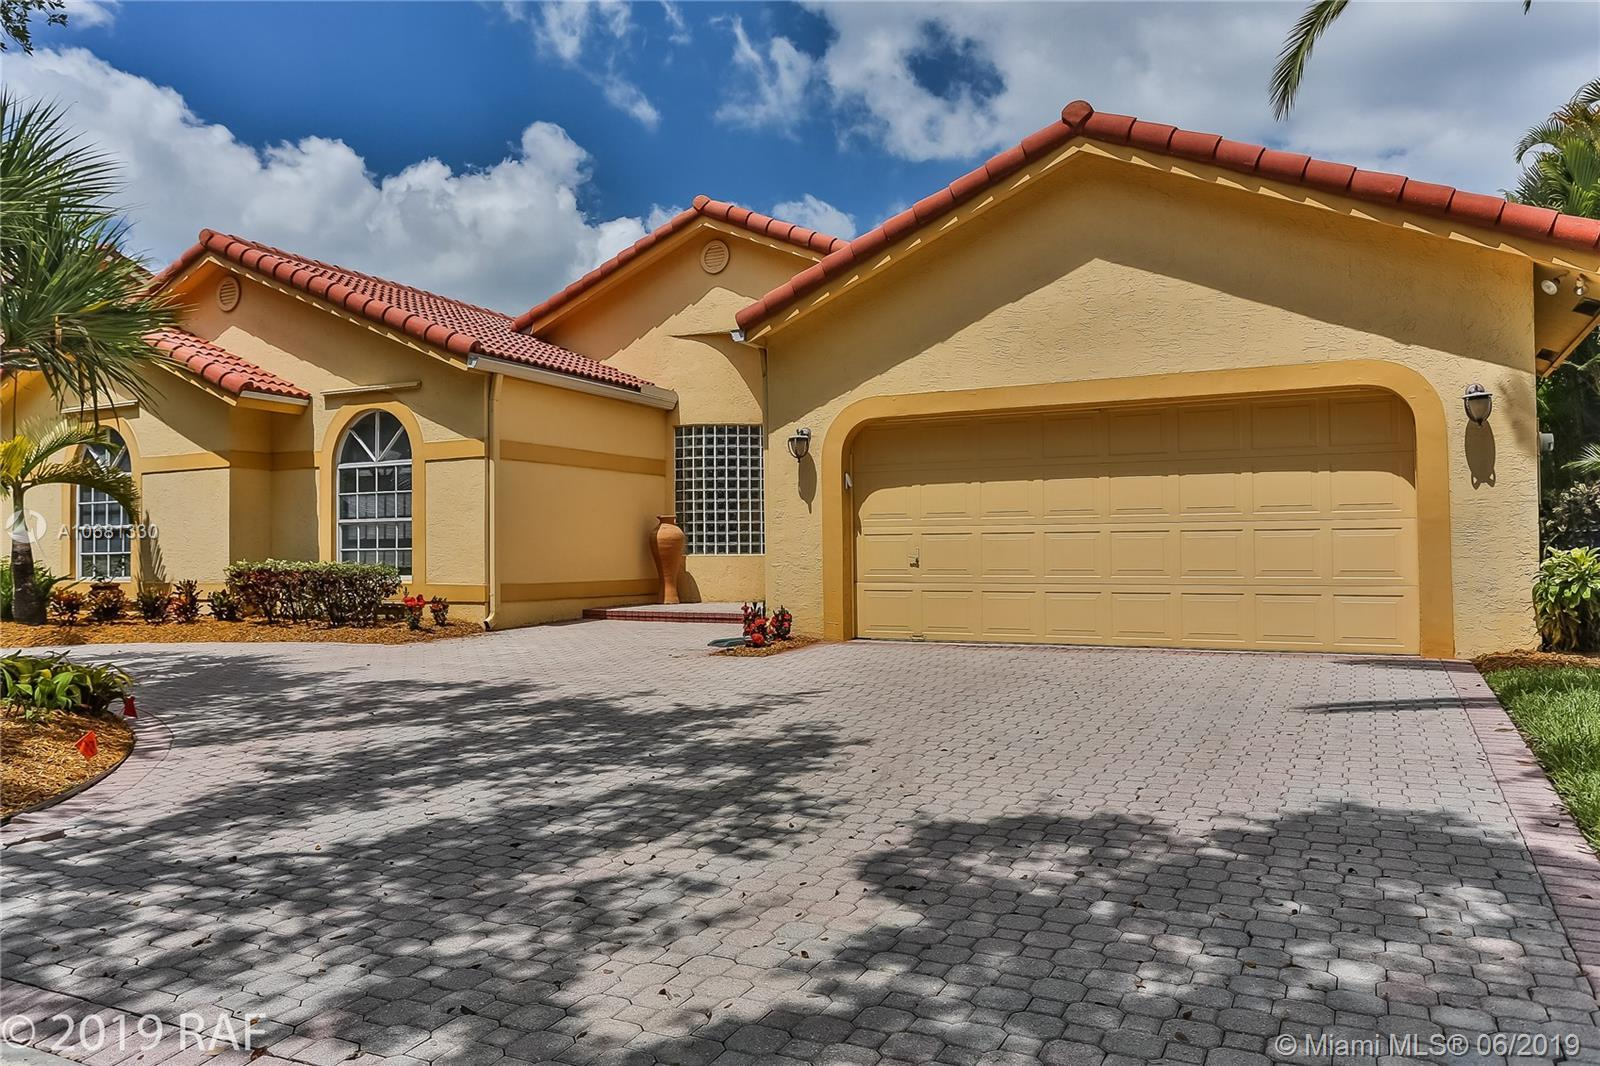 3594 Bimini Ave, Cooper City, FL | MLS# A10681330 | Indhira